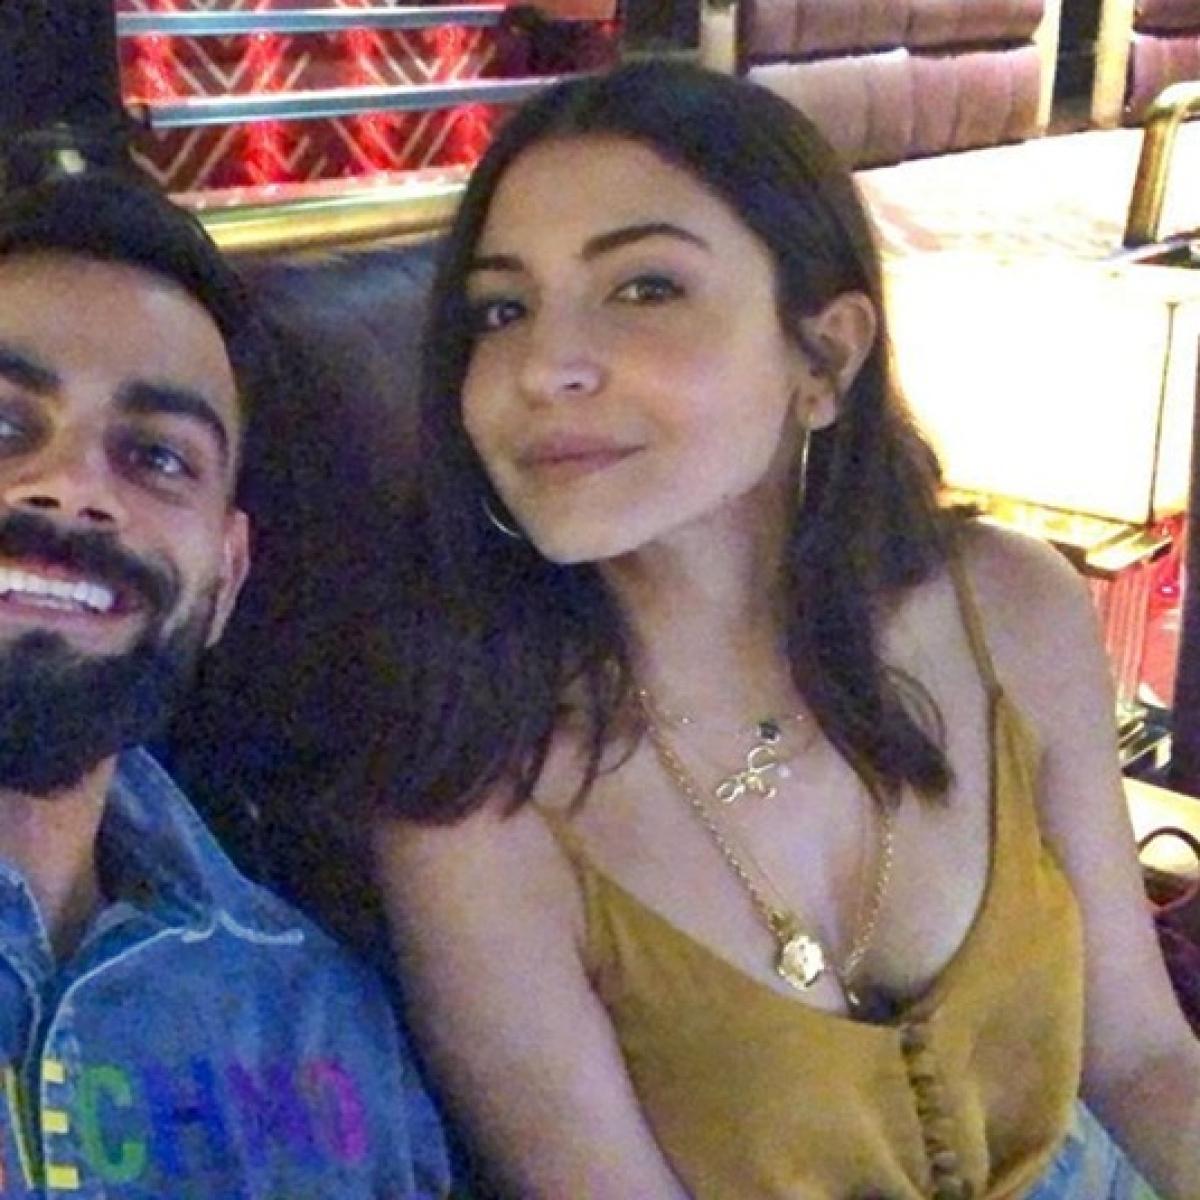 Virat Kohli has an intimate movie date with his 'hottie' Anushka Sharma